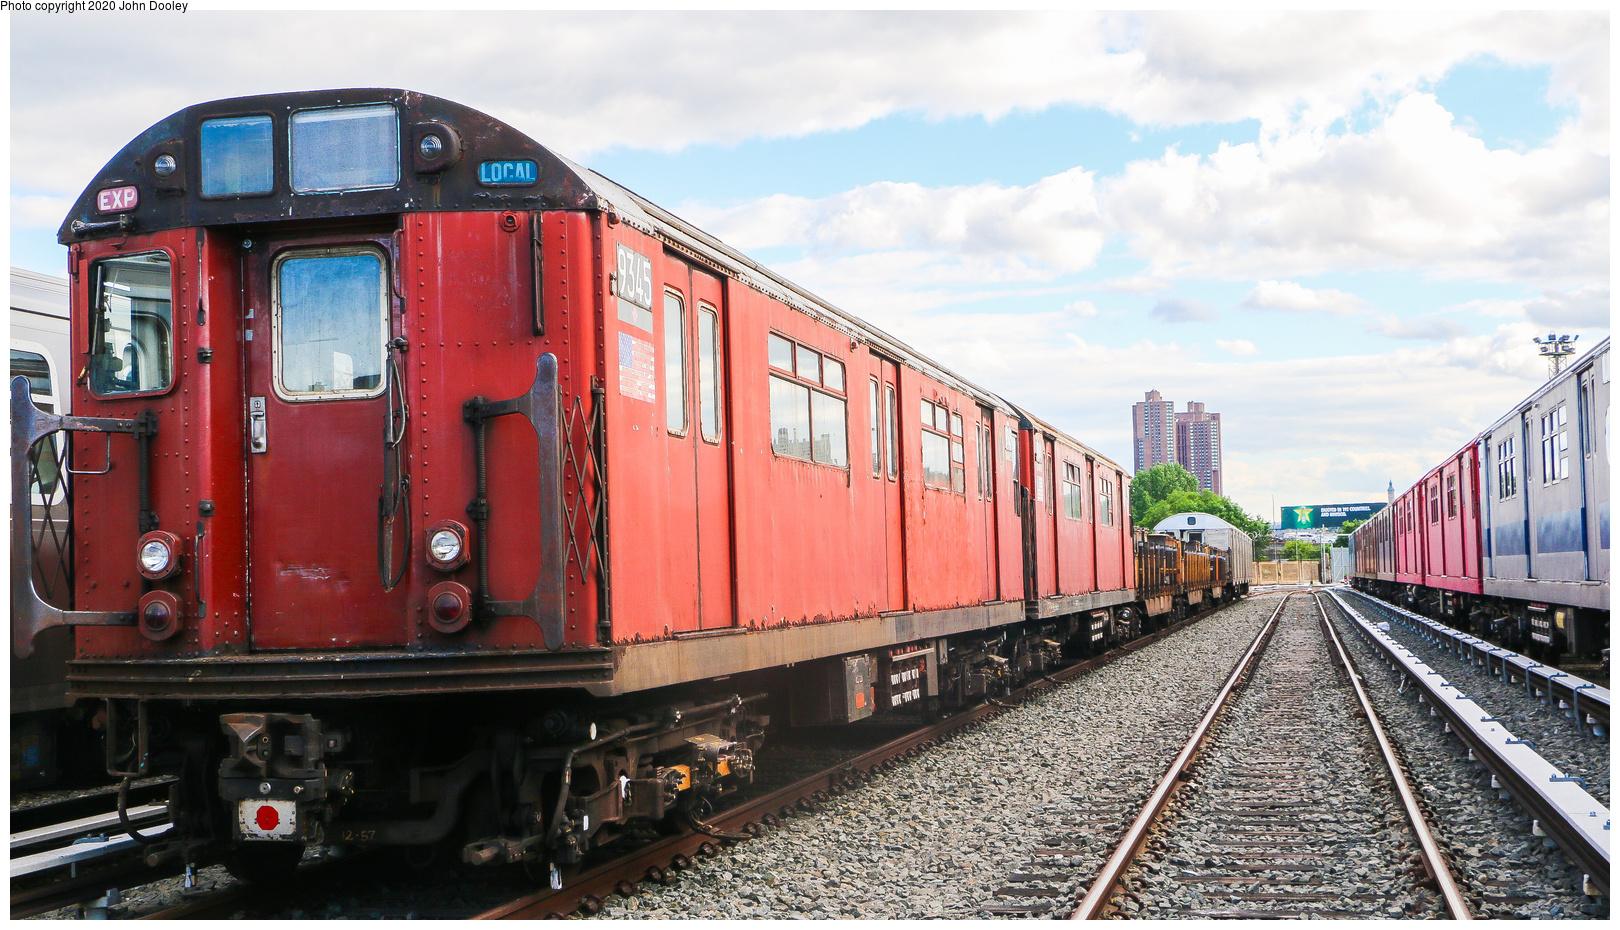 (796k, 1620x930)<br><b>Country:</b> United States<br><b>City:</b> New York<br><b>System:</b> New York City Transit<br><b>Location:</b> 207th Street Yard<br><b>Car:</b> R-33 World's Fair (St. Louis, 1963-64) 9345 <br><b>Photo by:</b> John Dooley<br><b>Date:</b> 6/15/2018<br><b>Viewed (this week/total):</b> 4 / 281